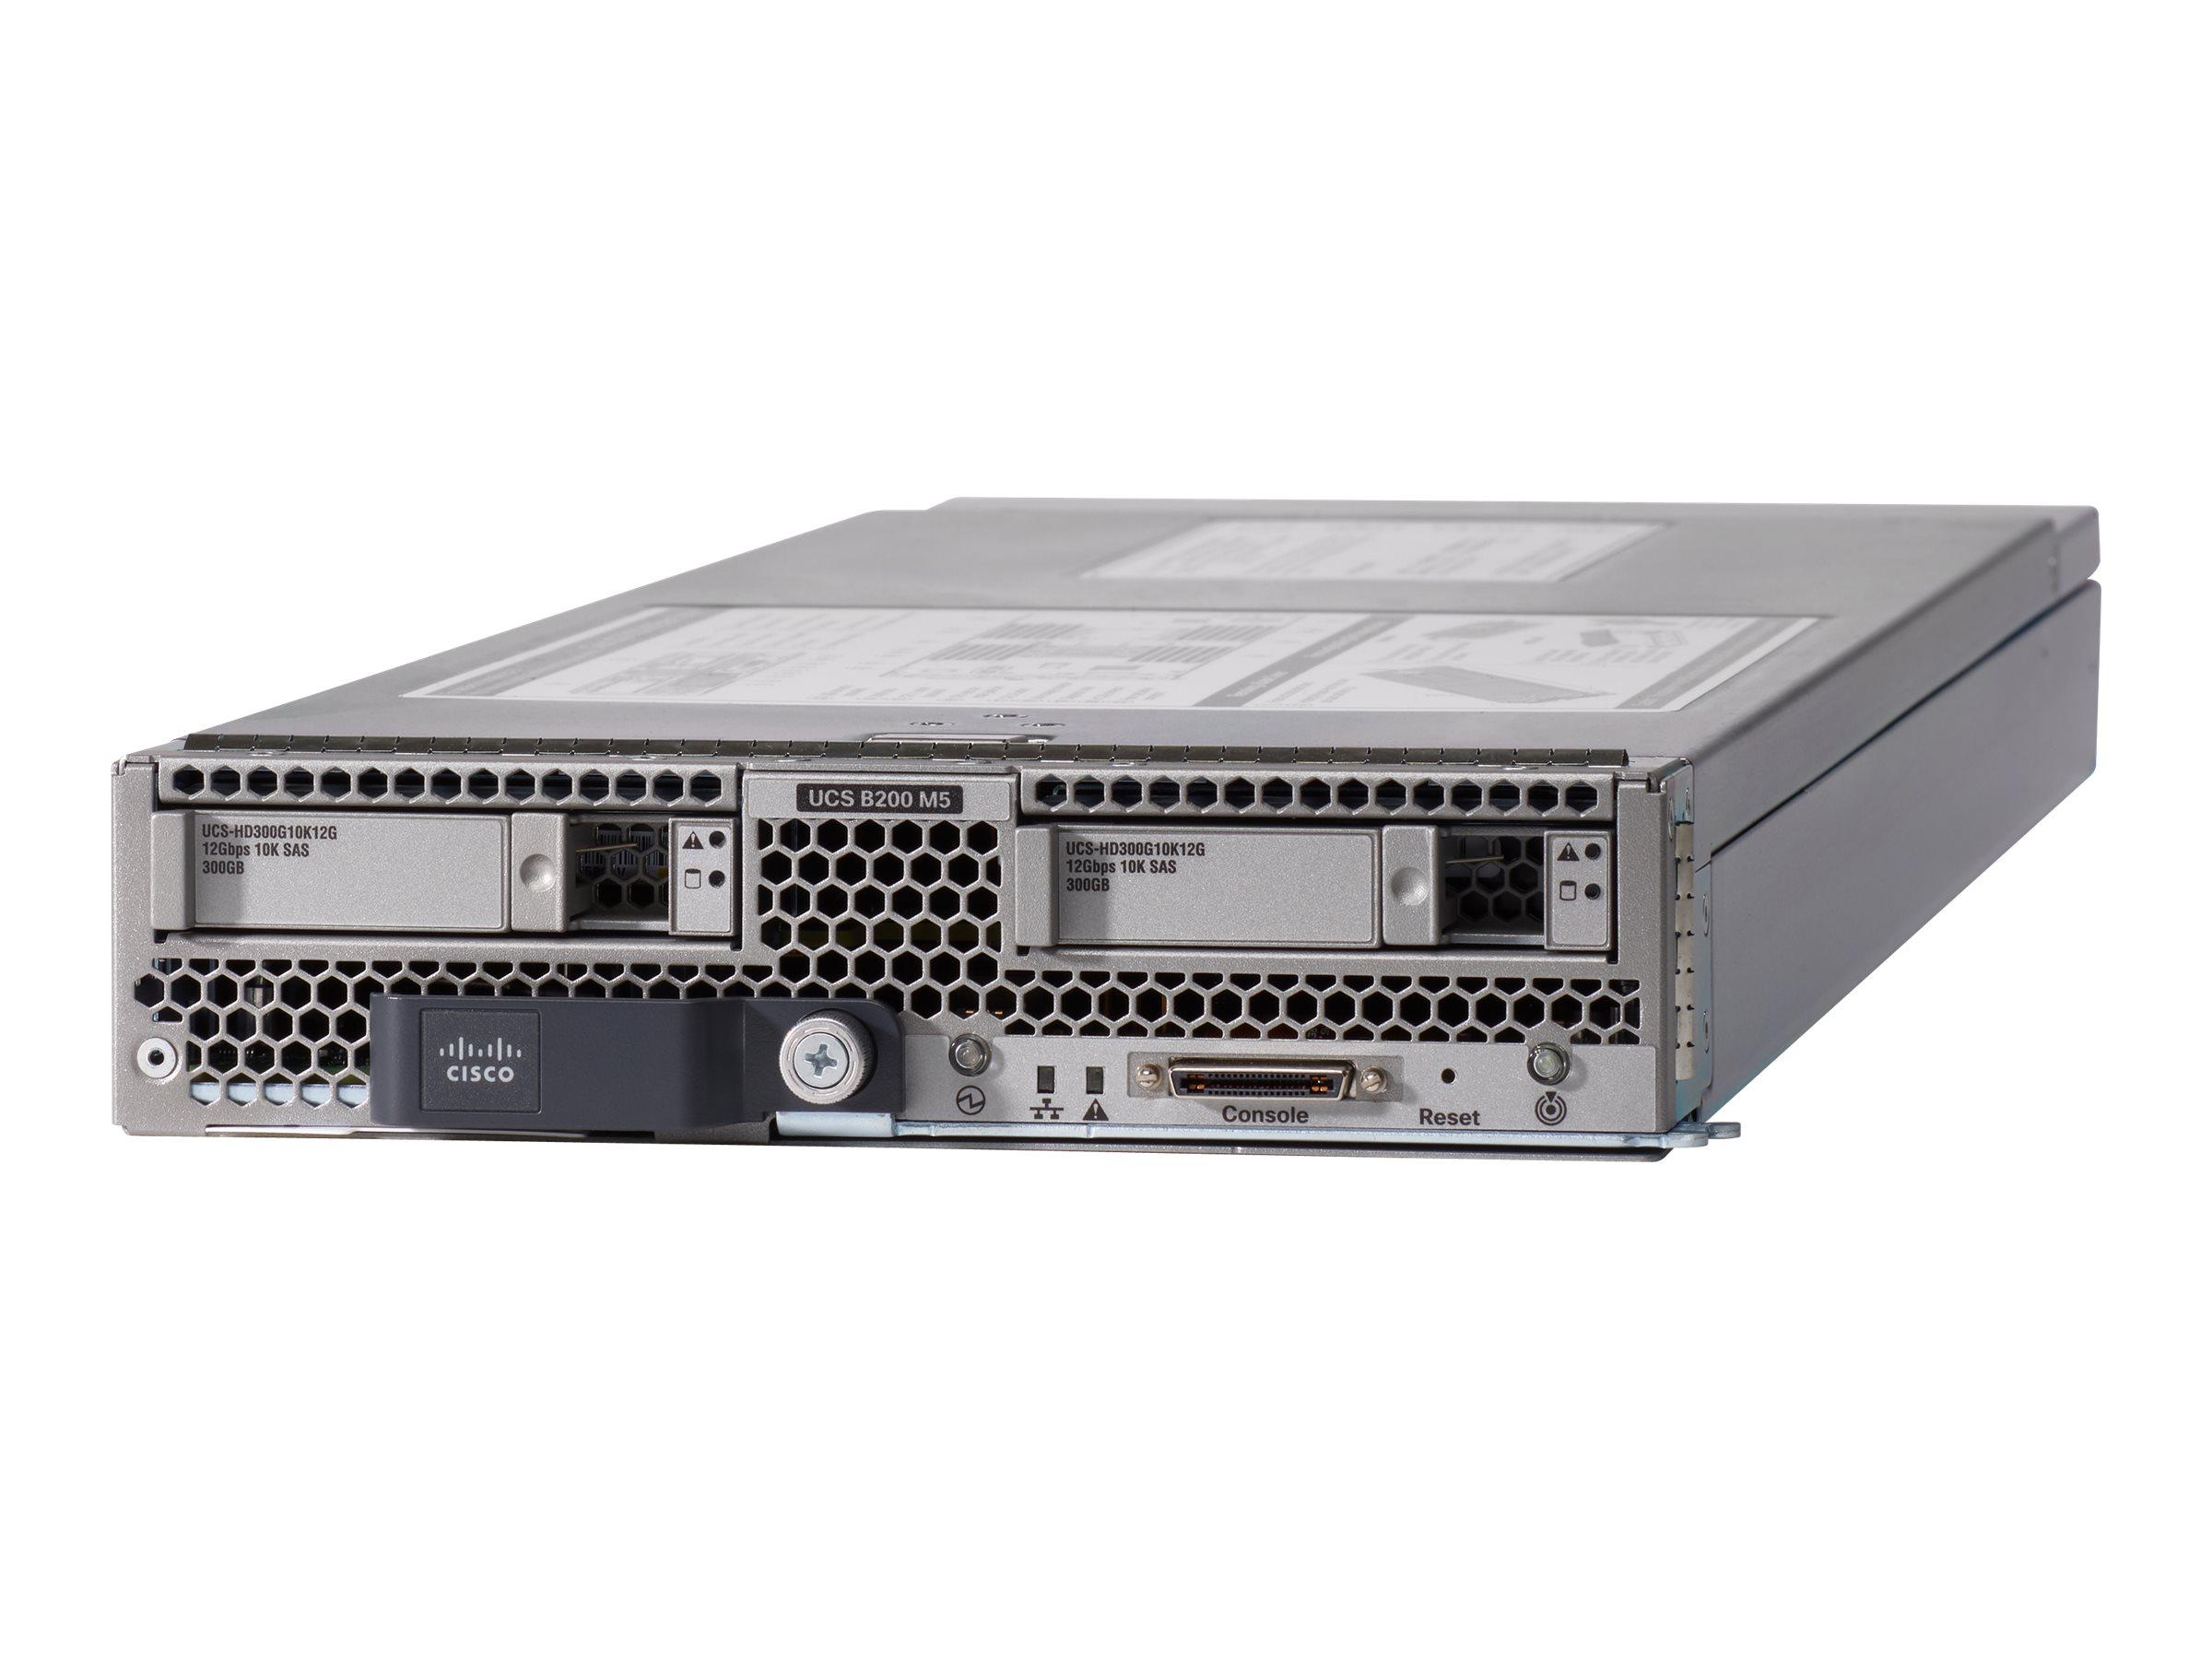 Cisco UCS B200 M5 Blade Server - Server - Blade - zweiweg - keine CPU - RAM 0 GB